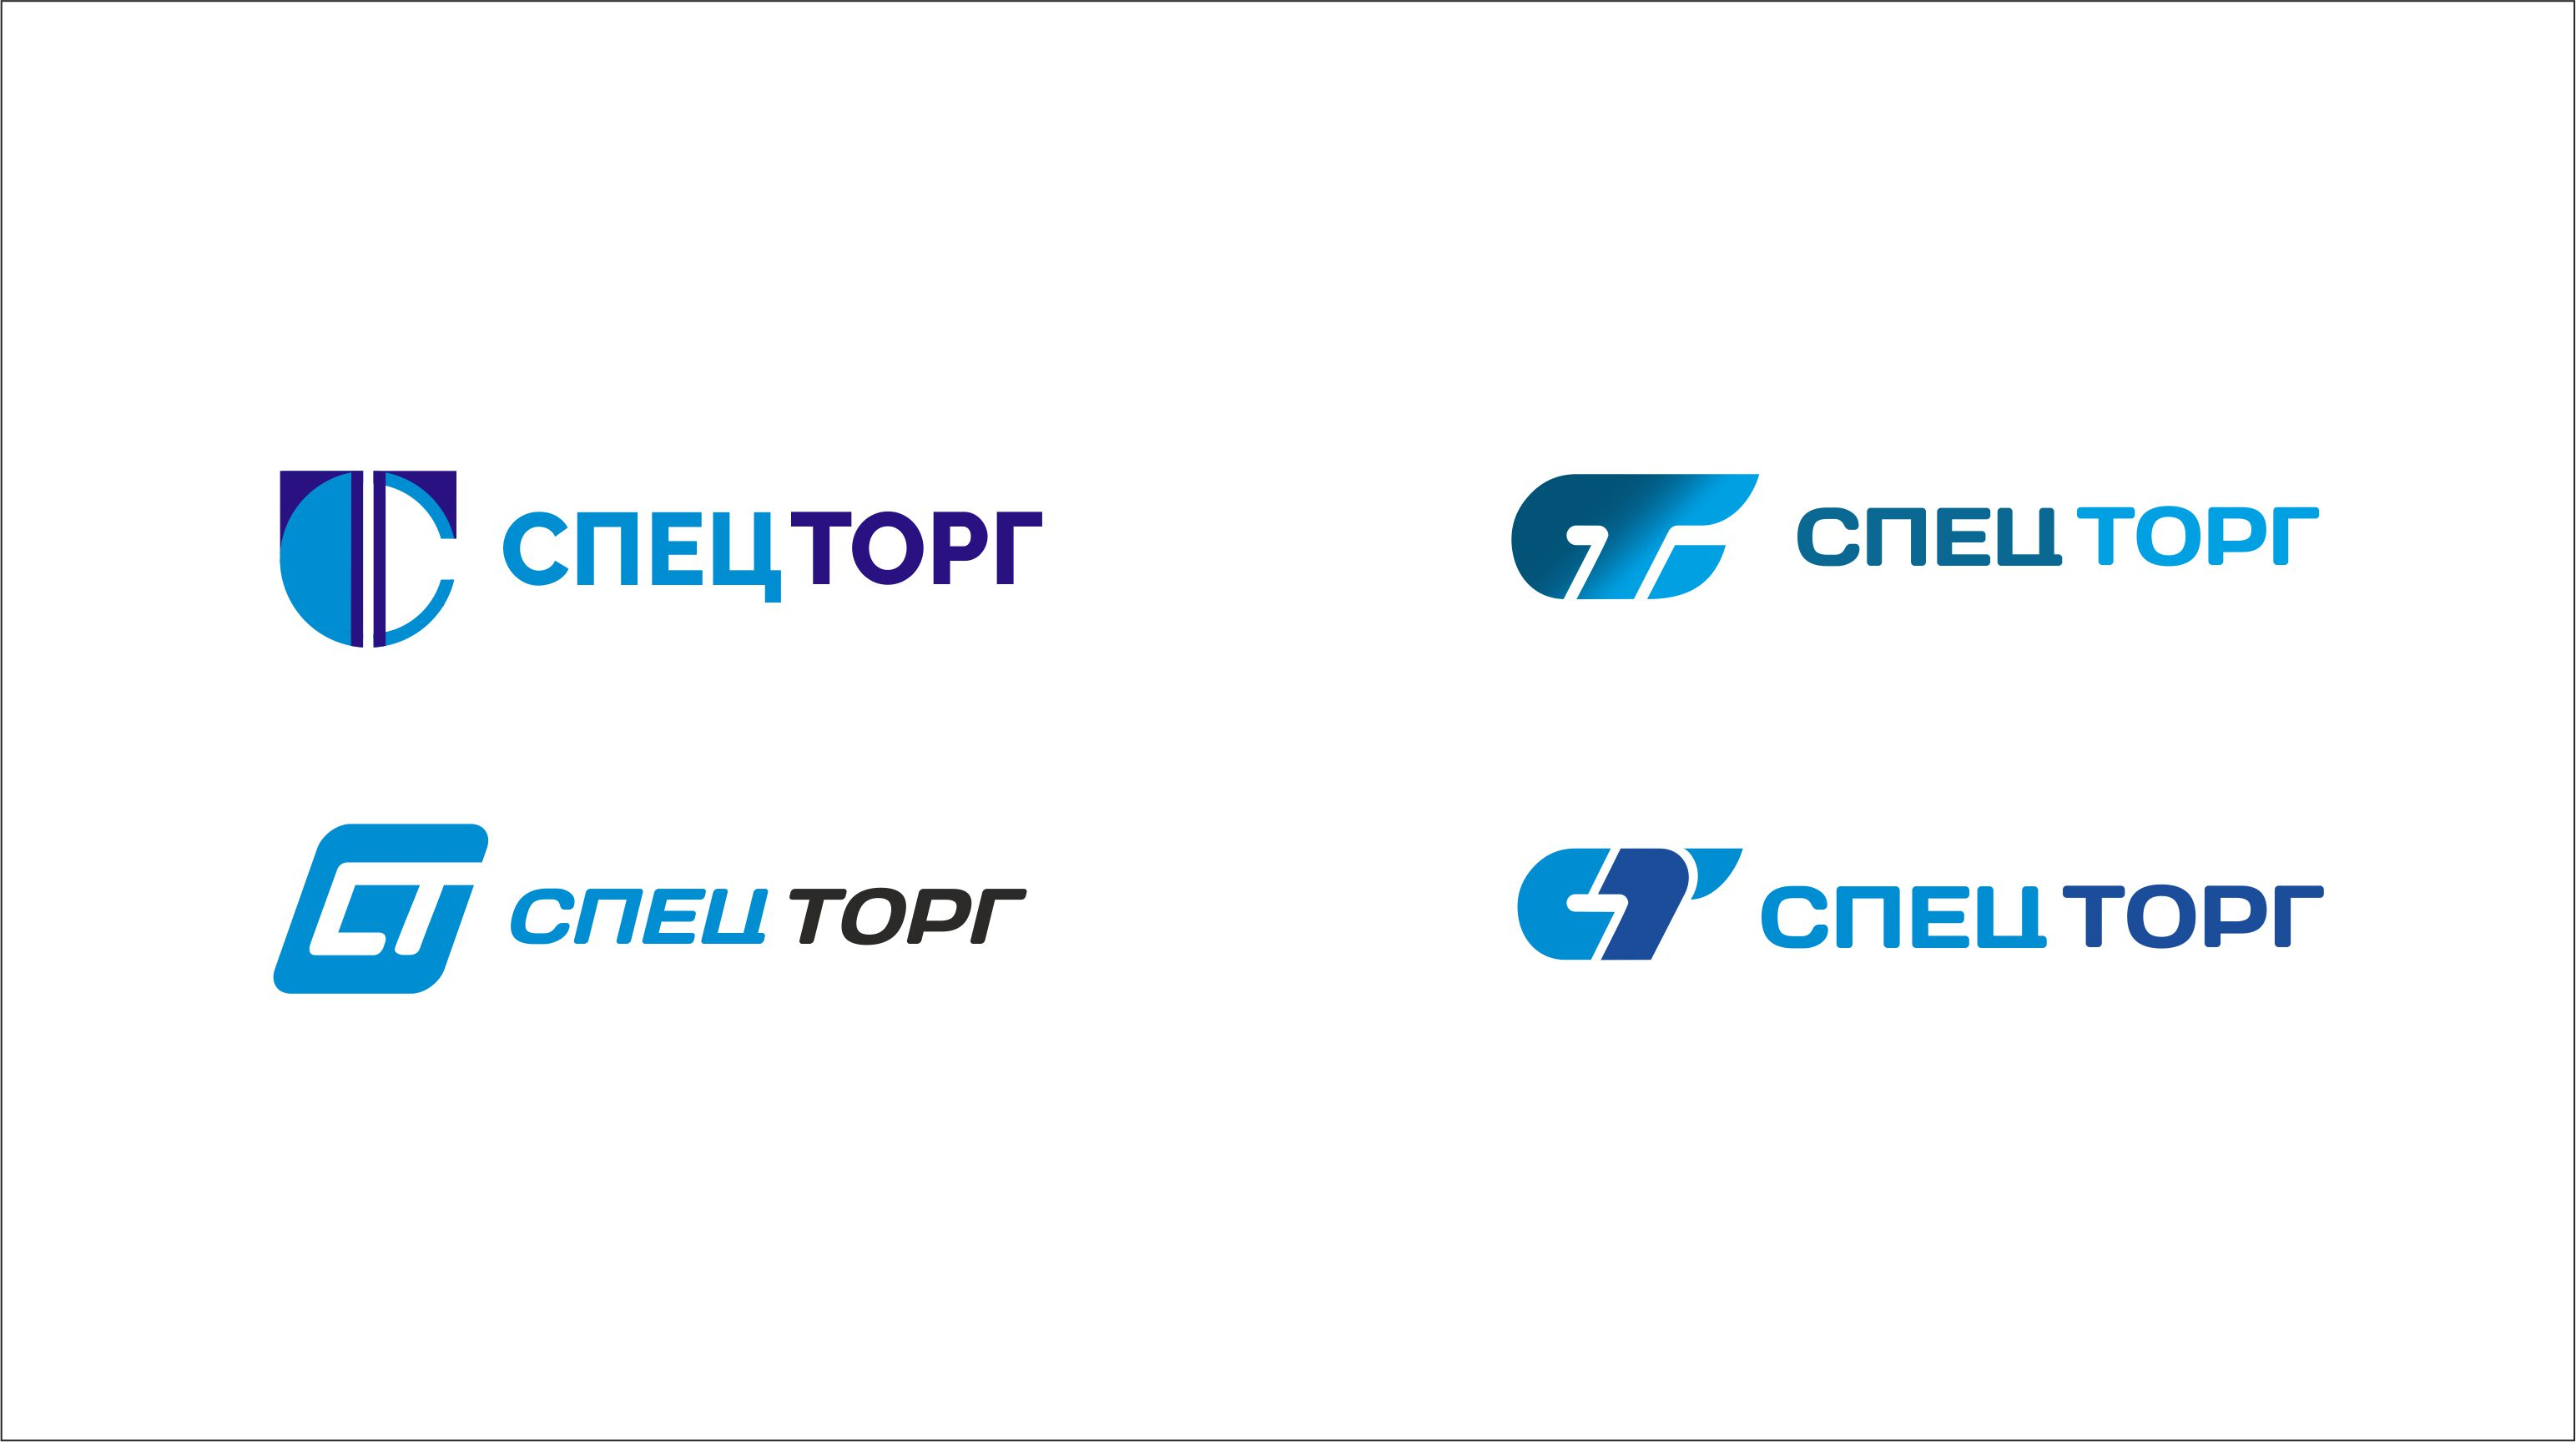 Разработать дизайн  логотипа компании фото f_0045dd165e44db71.jpg